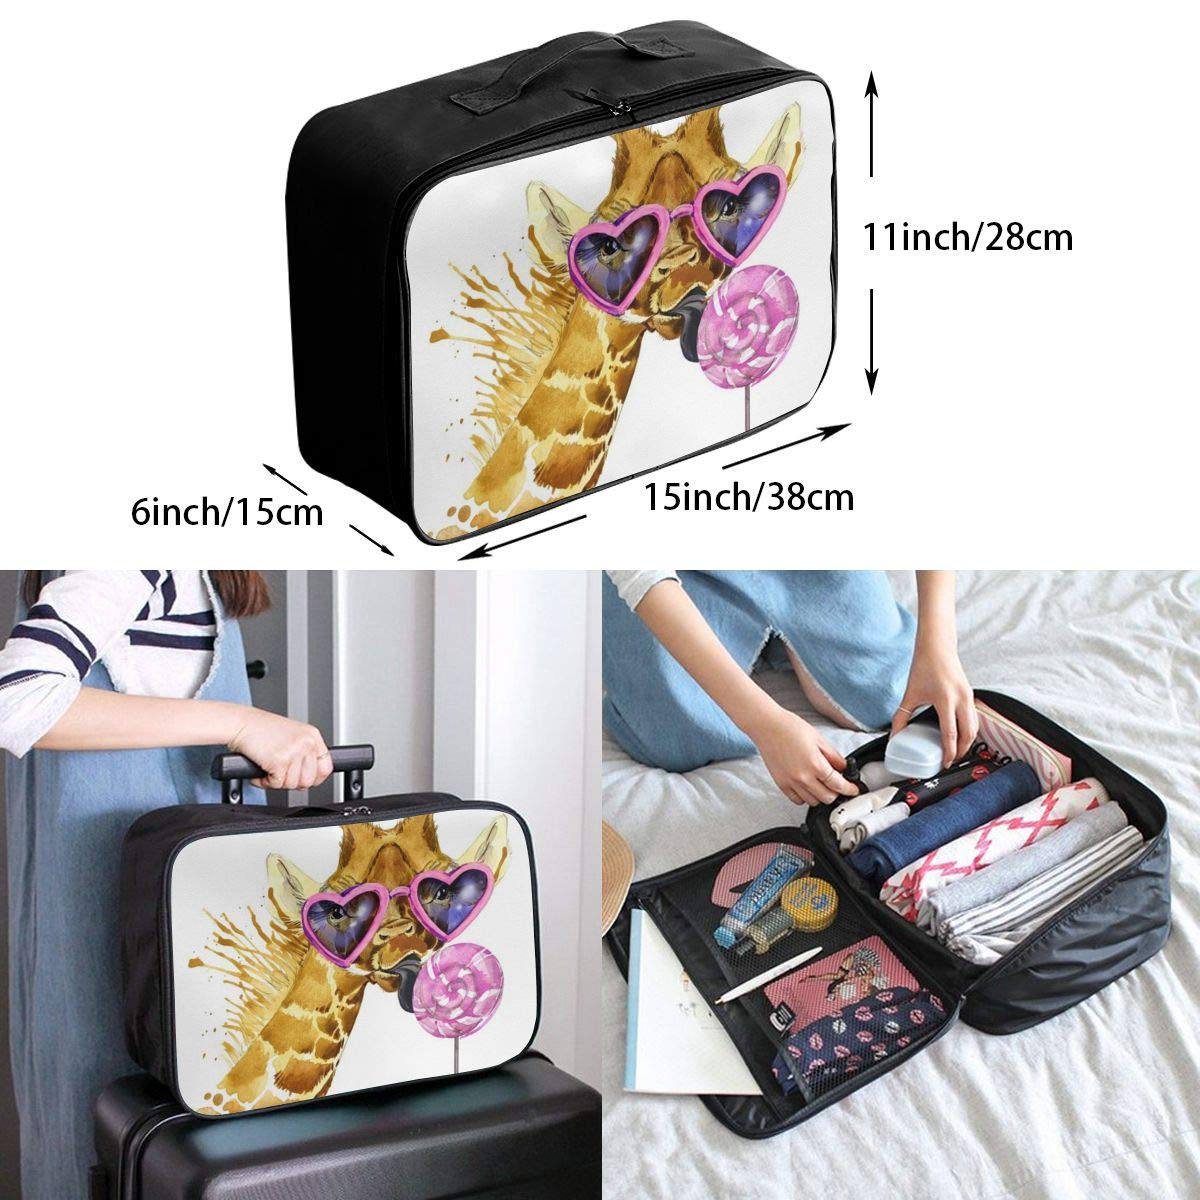 ADGAI Funny Giraffe Canvas Travel Weekender Bag,Fashion Custom Lightweight Large Capacity Portable Luggage Bag,Suitcase Trolley Bag